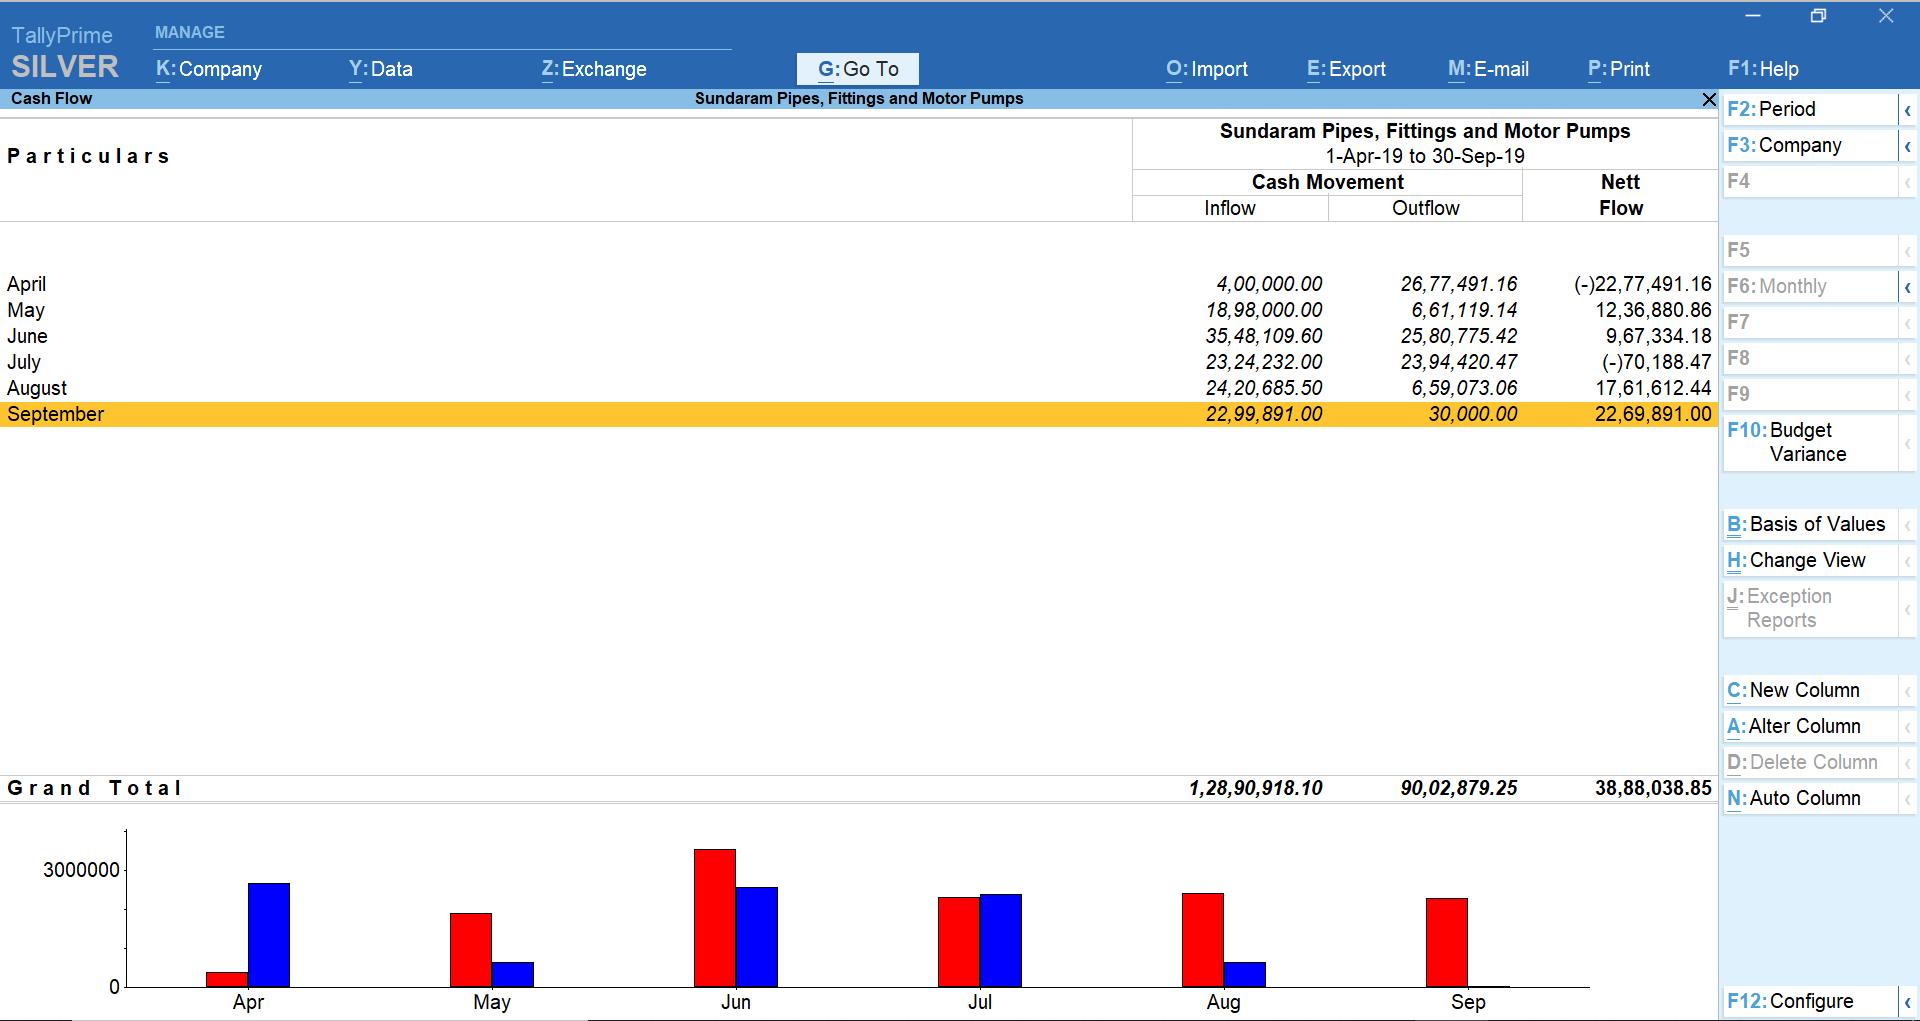 Cash flow analysis report